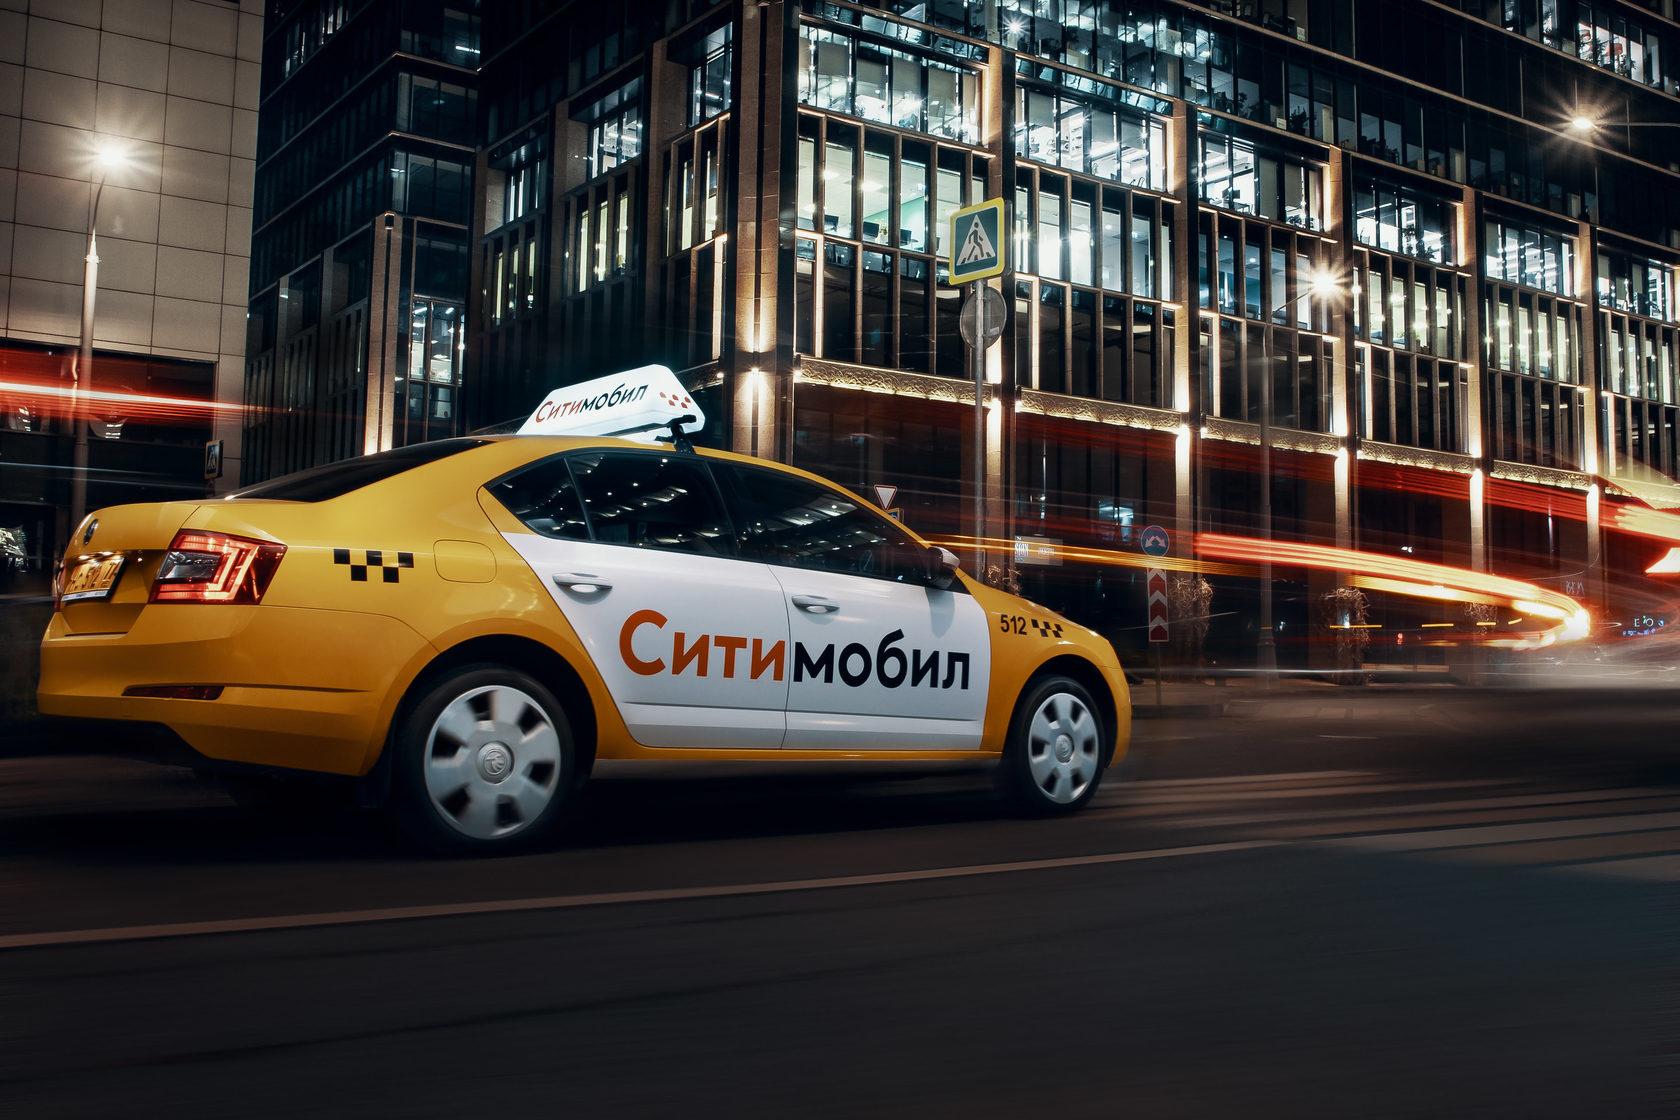 Горячая линия службы заказа такси СитиМобил